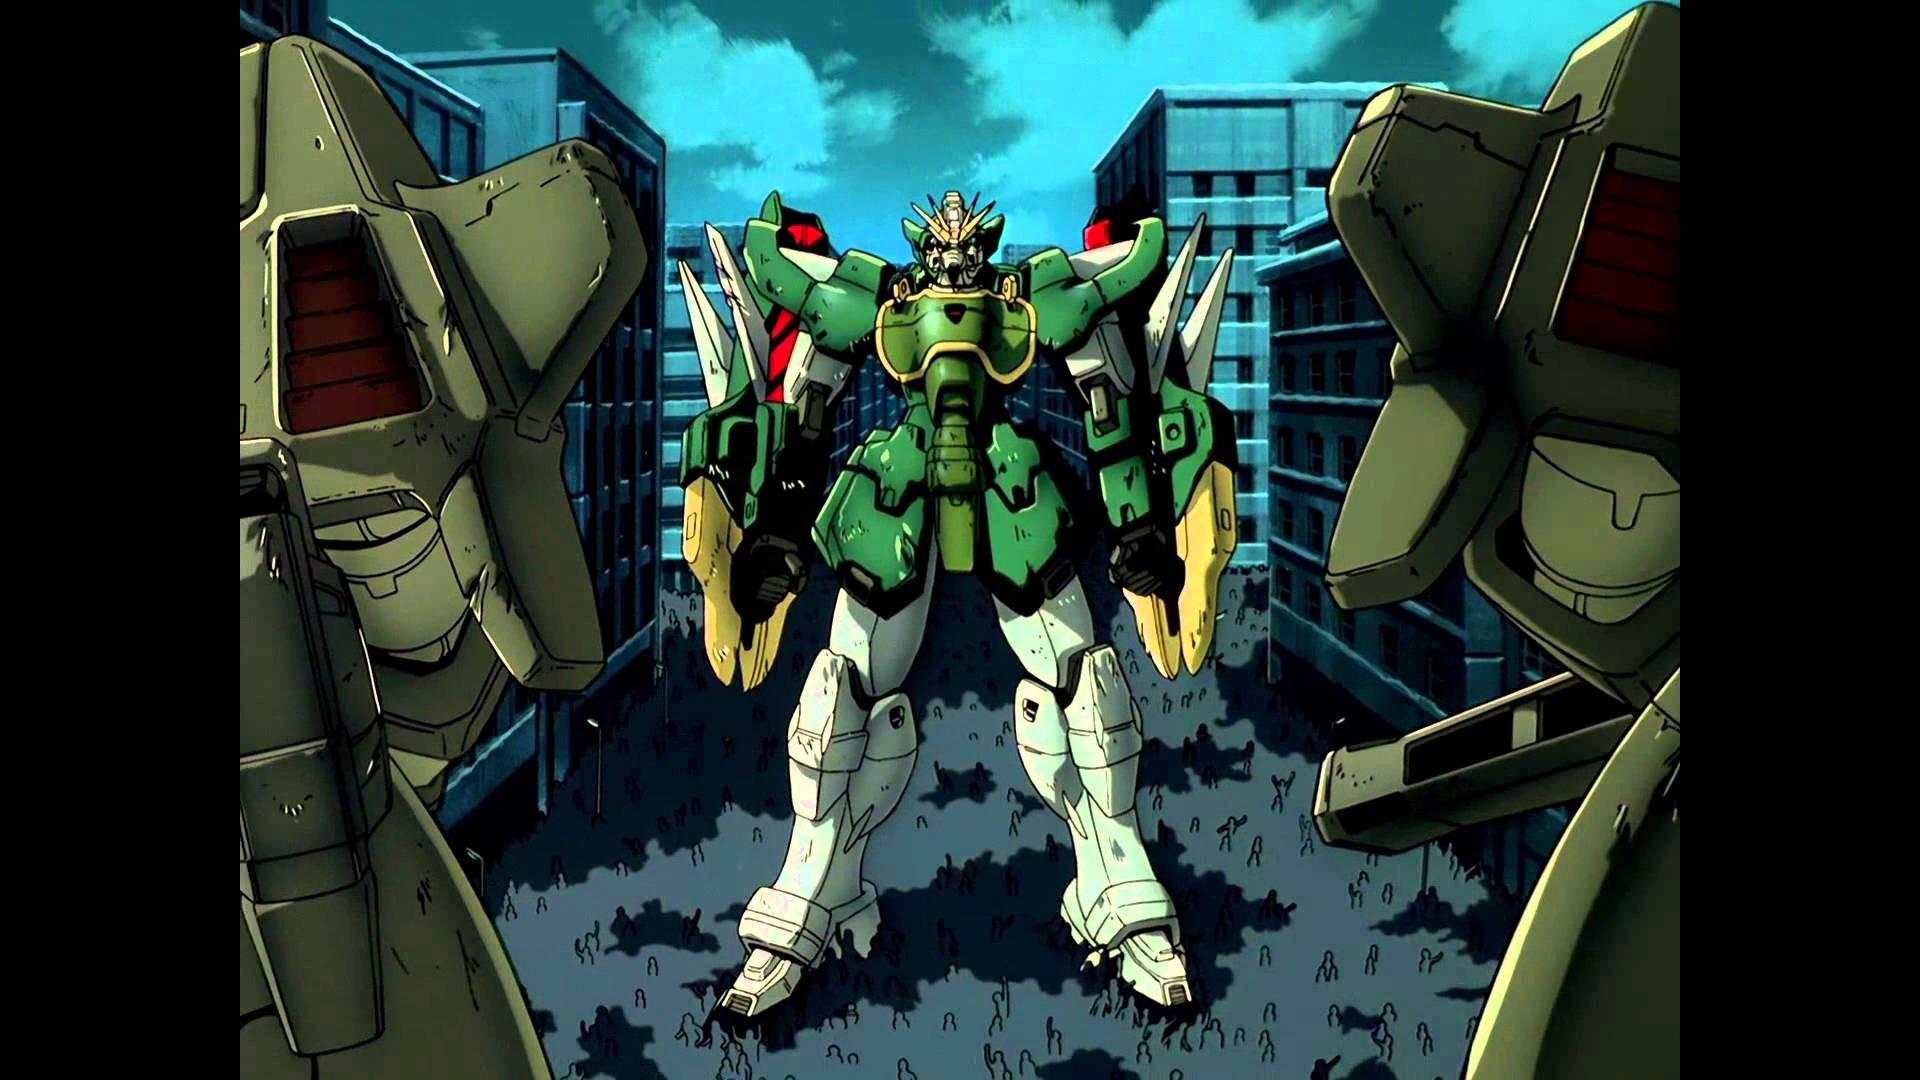 [Toonami 3.0] : Gundam Wing Endless Waltz – Suit Up, Again (Remastered)  [1080p]_v2